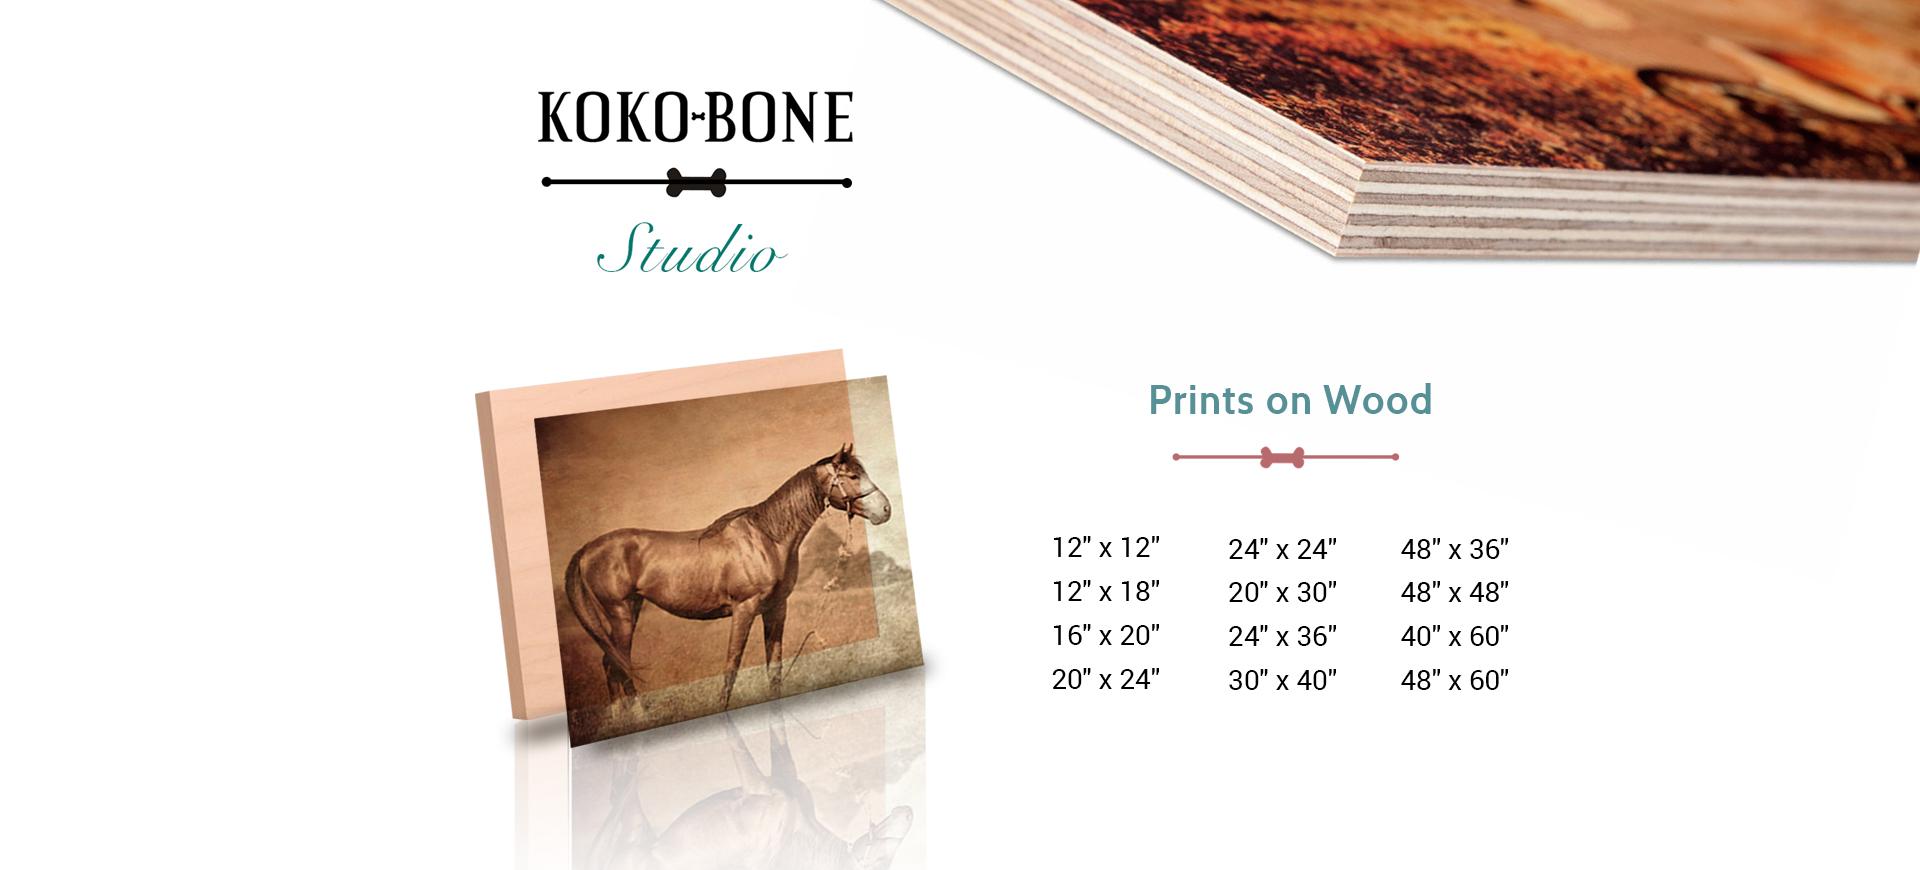 kokobone_woodprinting_slider1